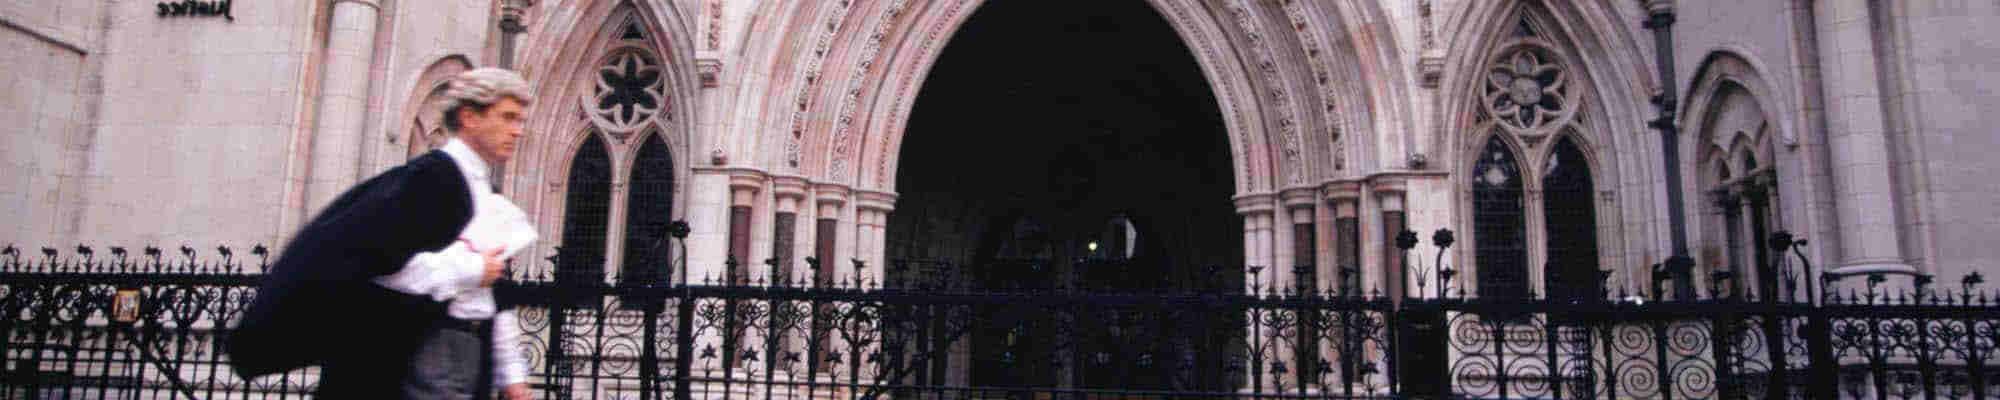 Q79 | Bachelor of Laws (Honours) (LLB) | Open University Degree